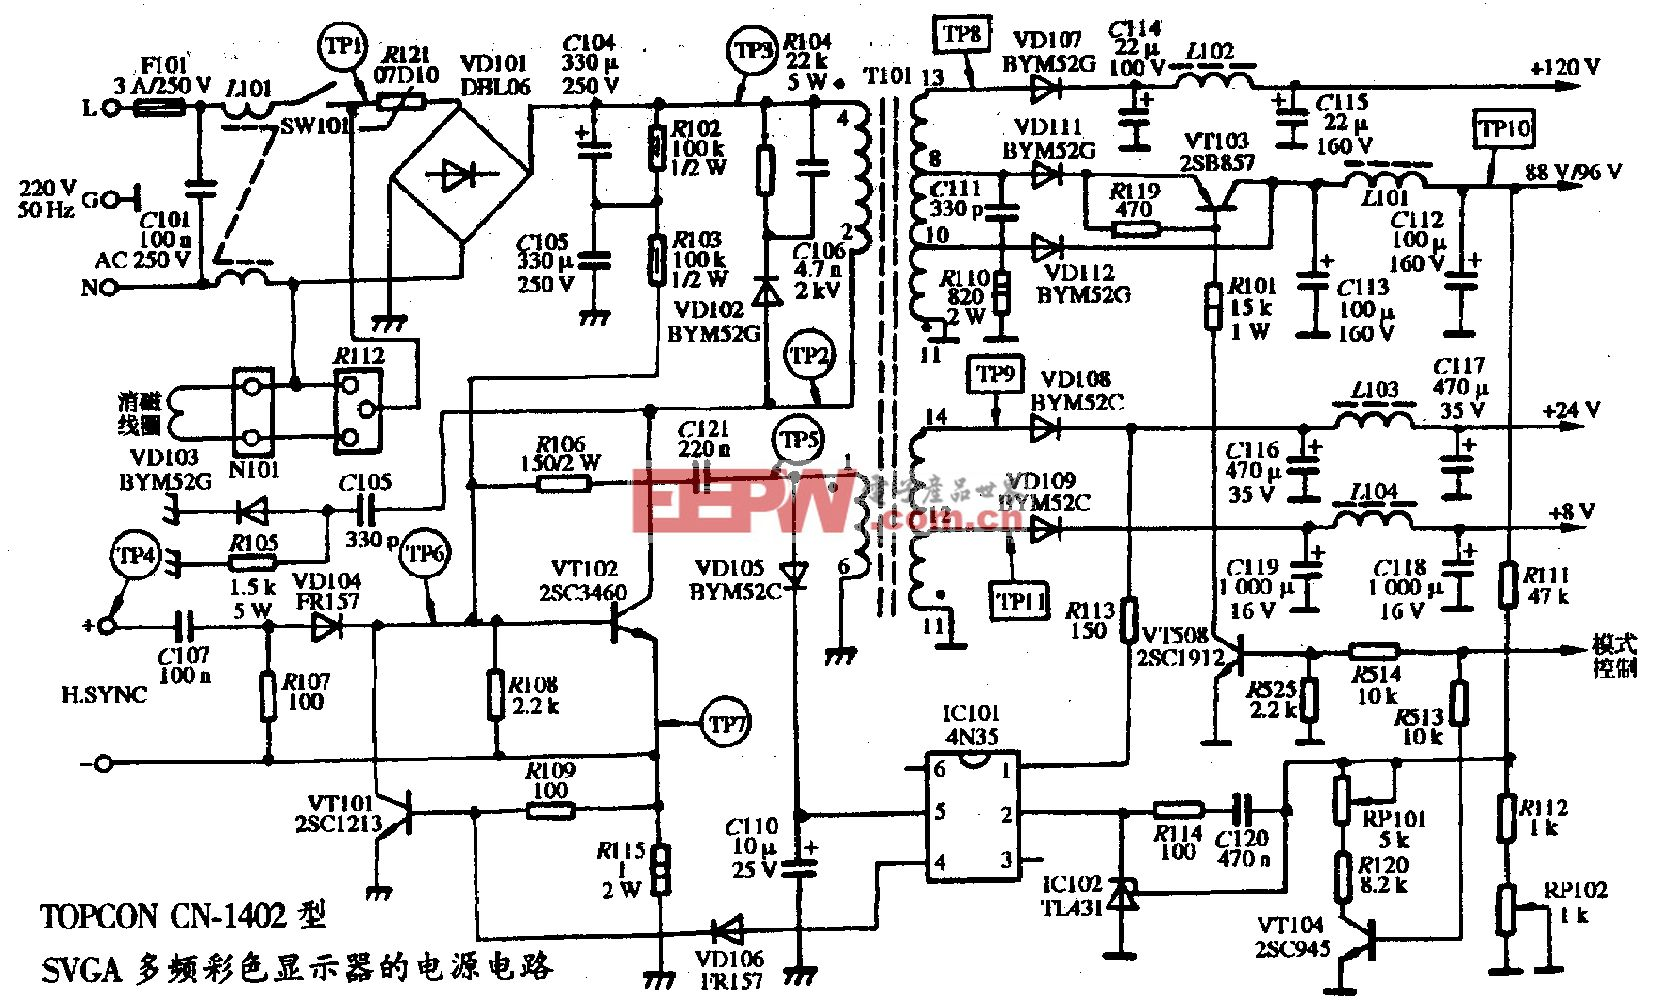 109、TOPCON CN-1402型SVGA彩色显示器的电源电路图